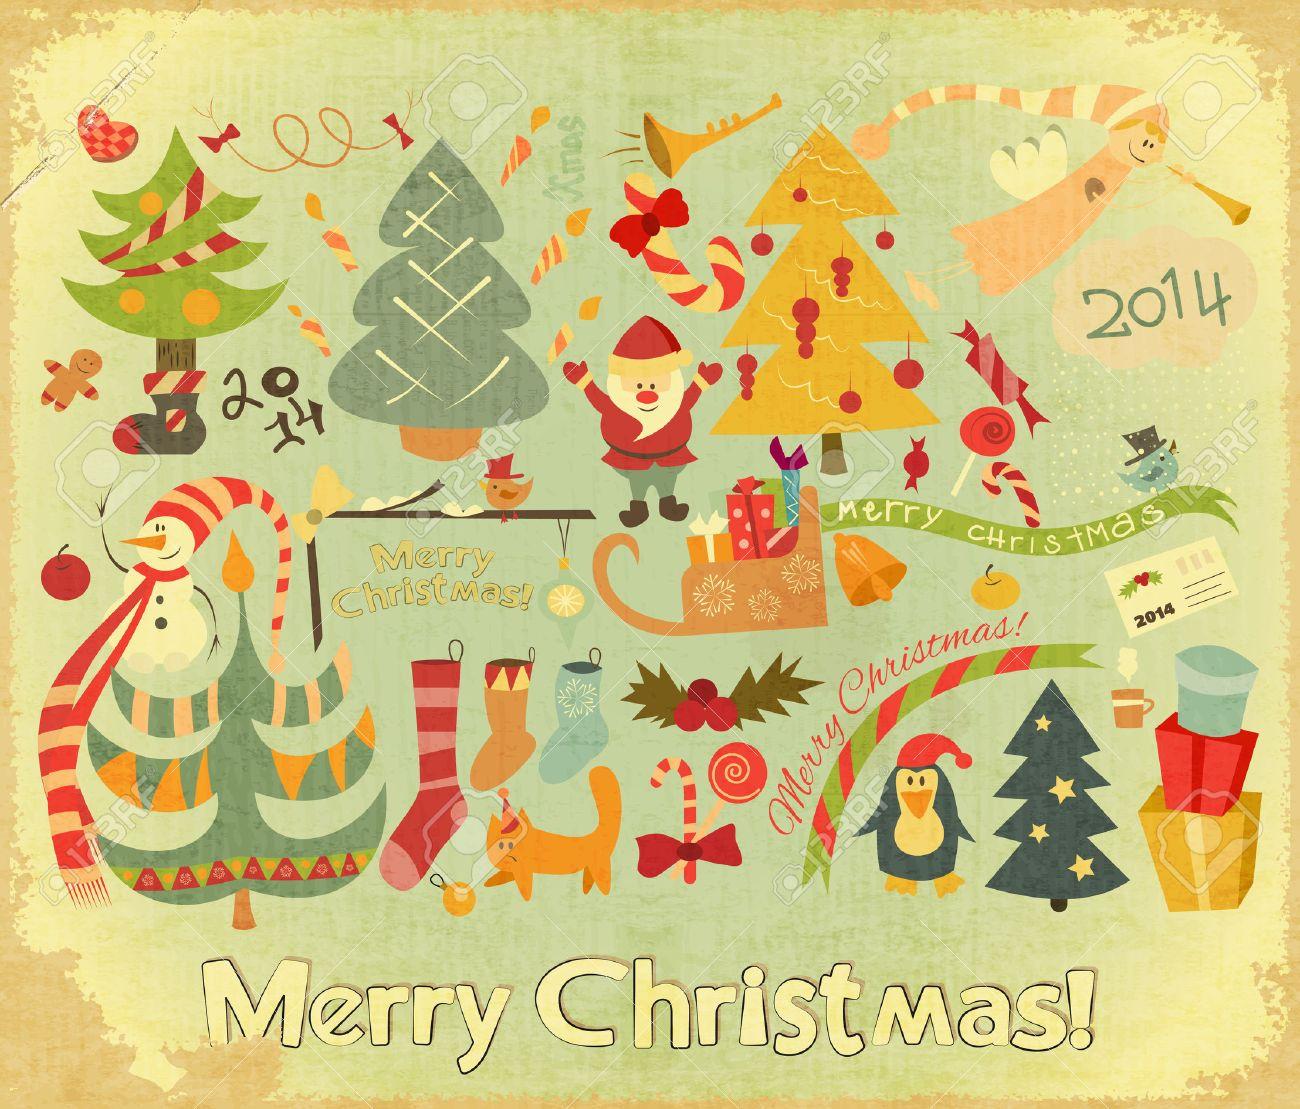 Retro Merry Christmas Card With Santa Claus, Christmas Tree And ...